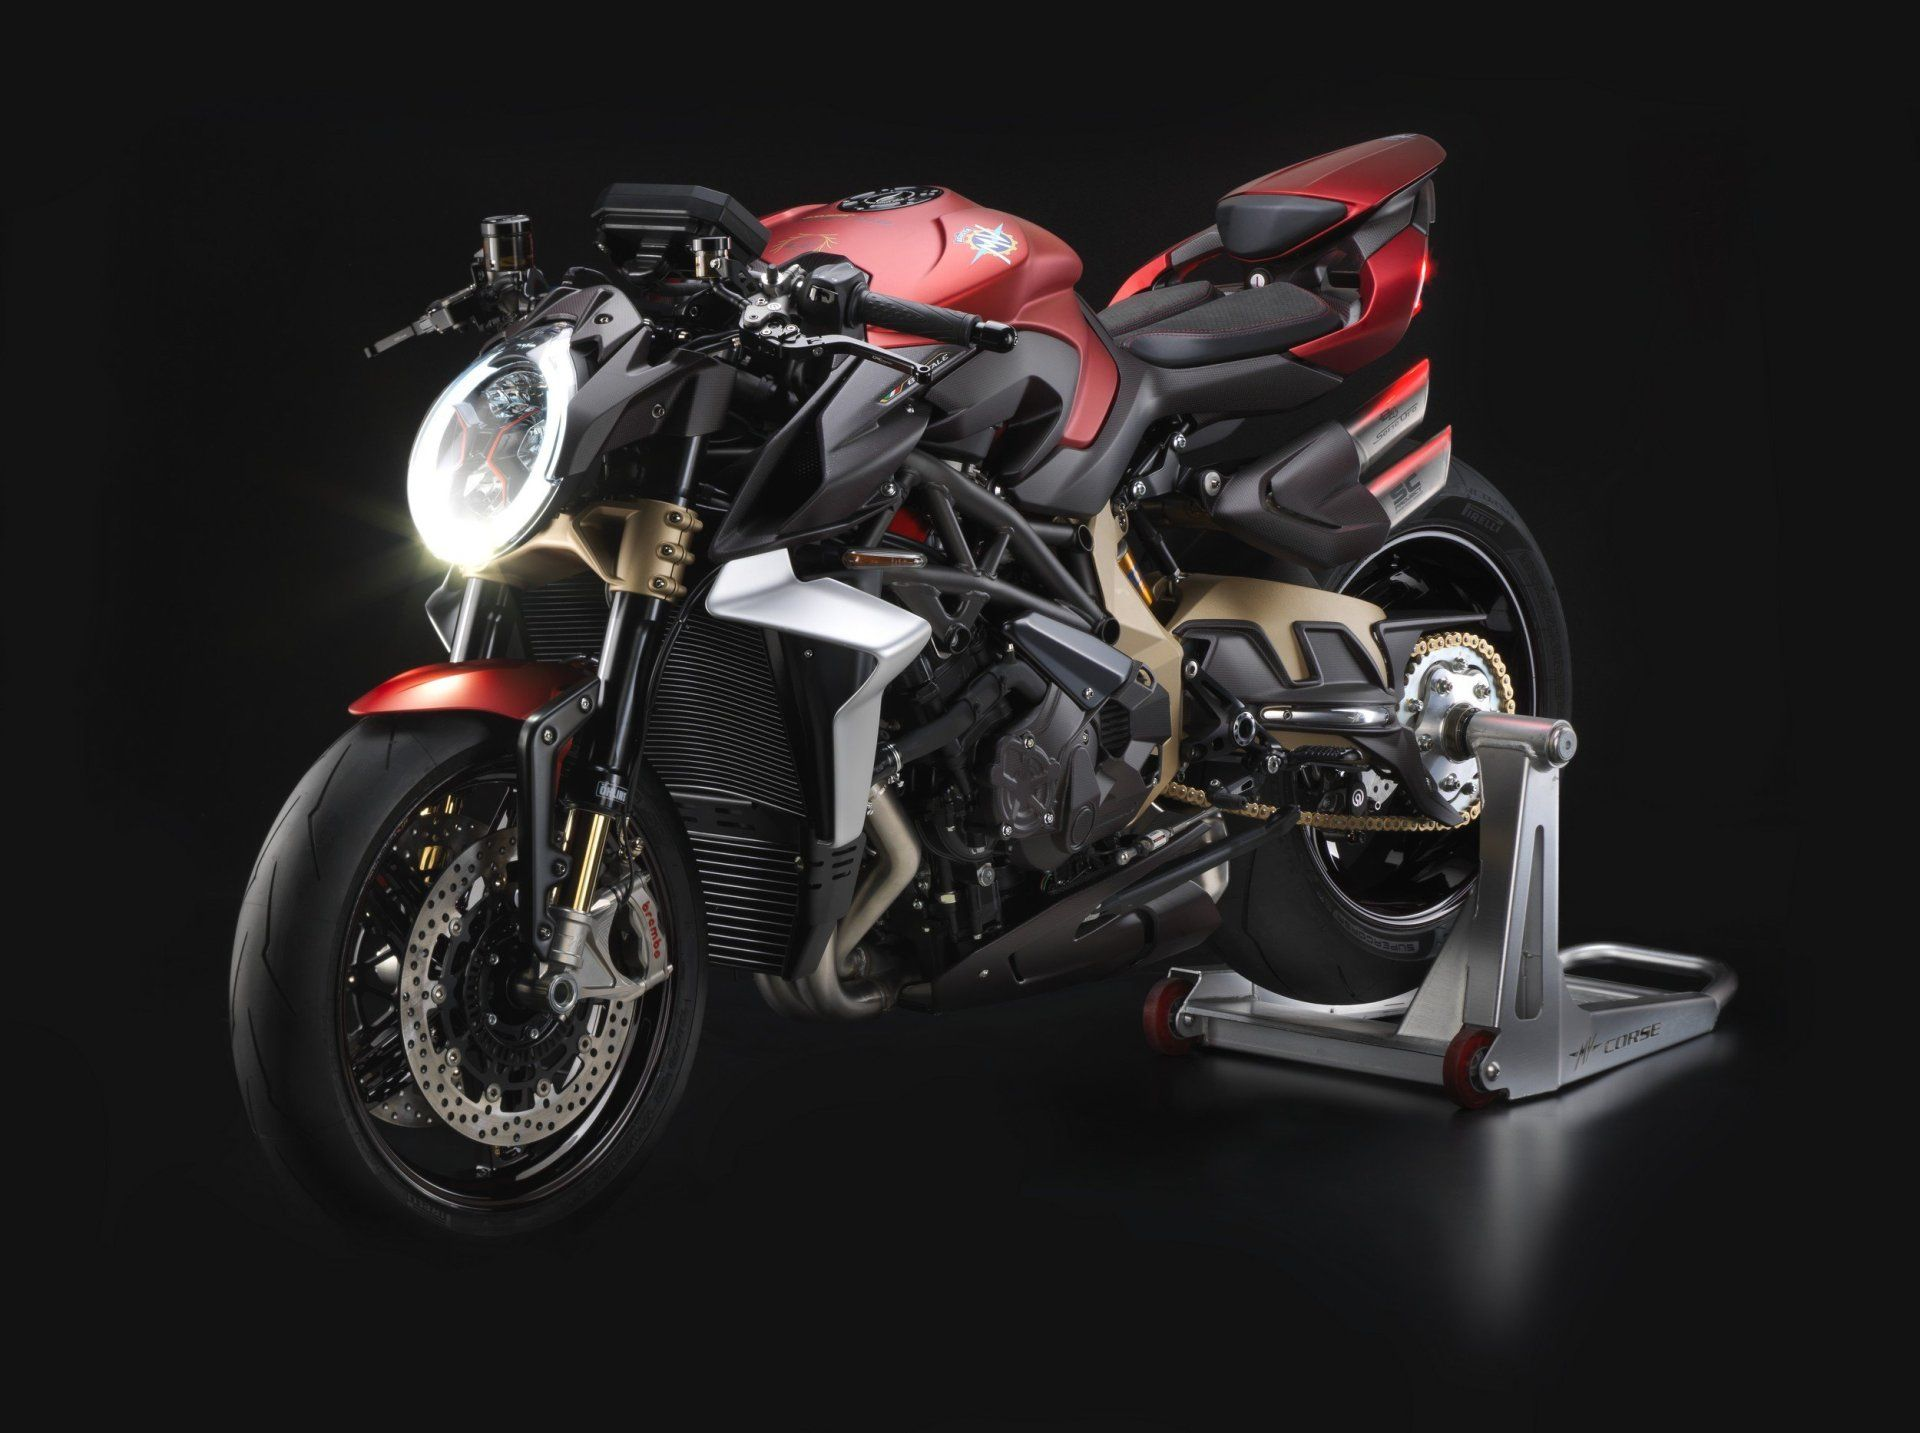 Pin On Motorbike Porn Mv agusta brutale 1000 serie oro